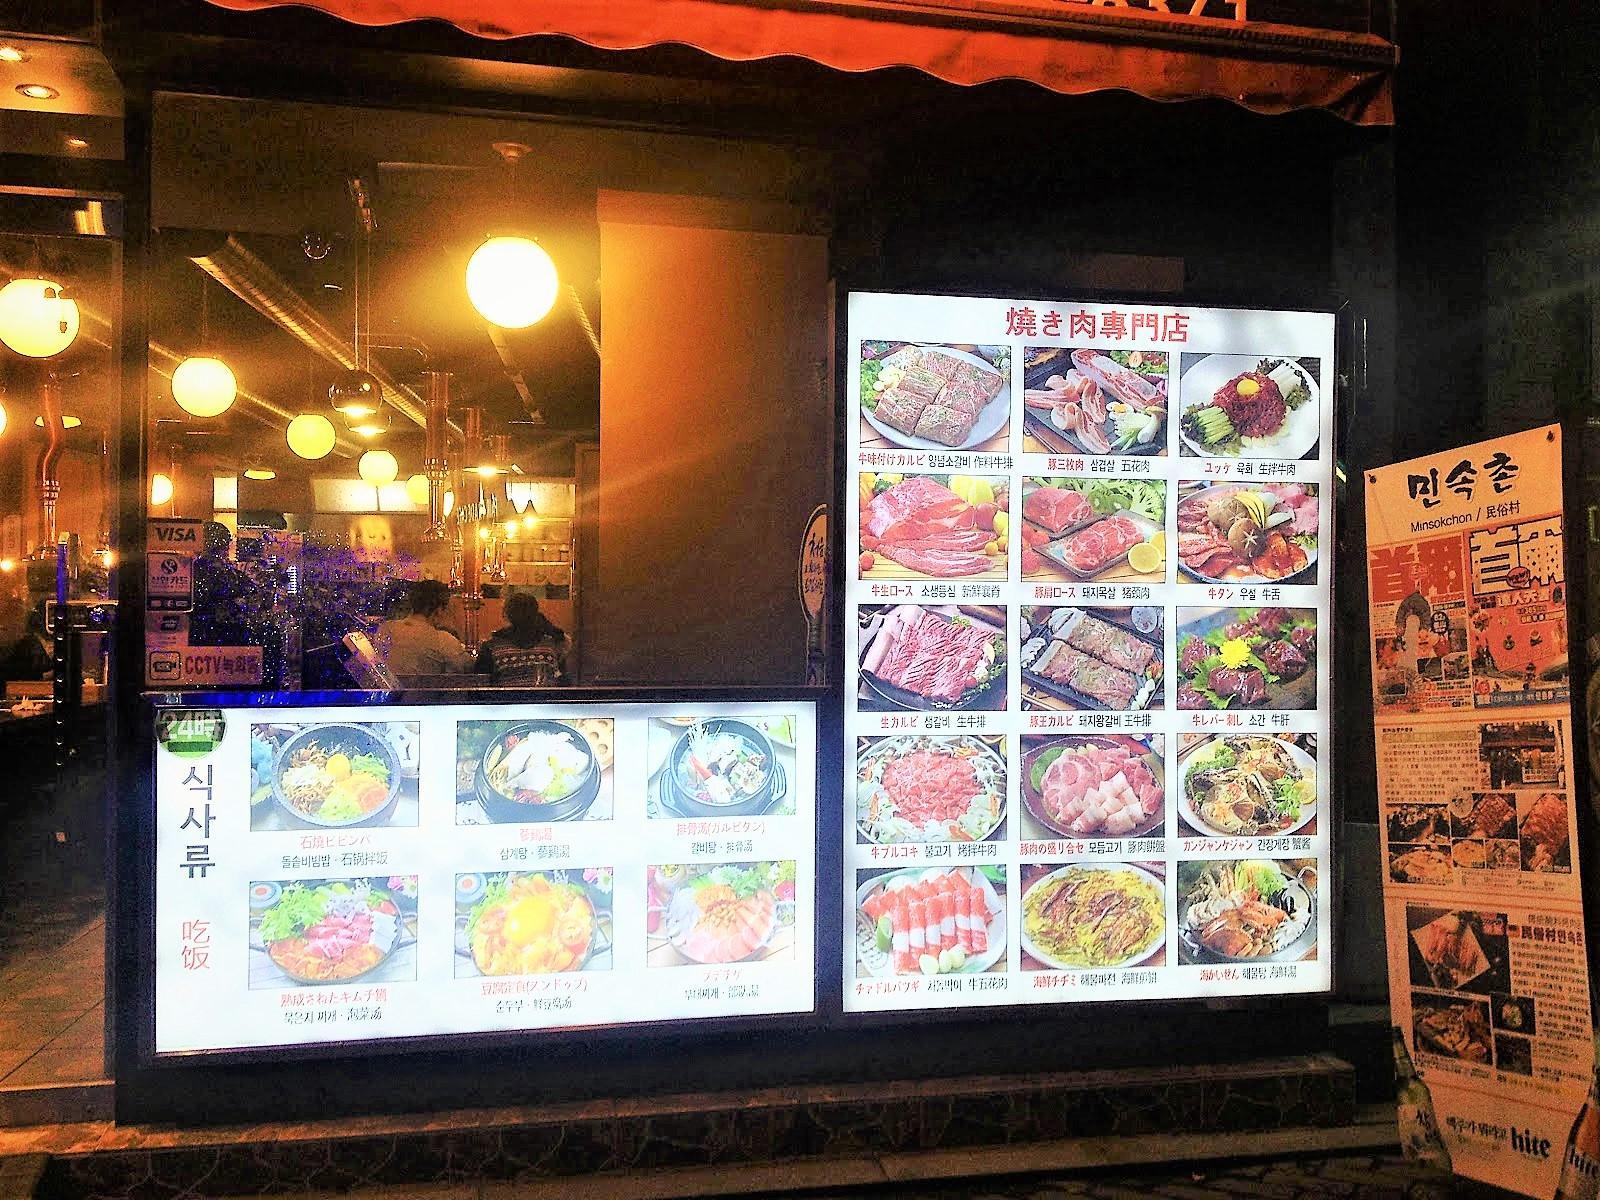 Minsokchon Restaurant